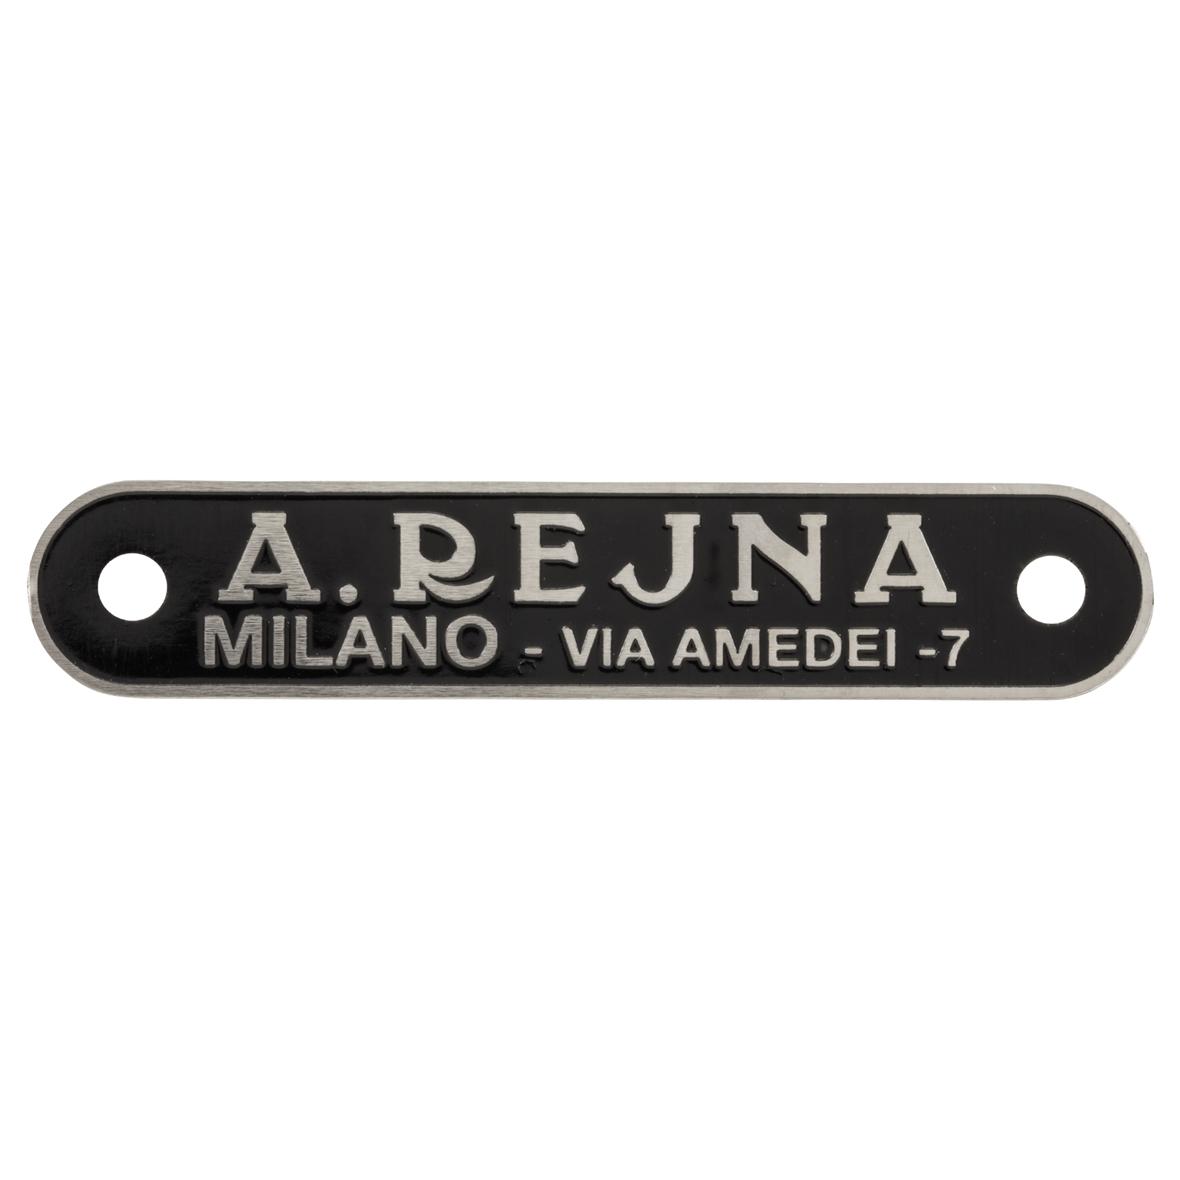 "Imagen del producto para 'Logotipo ""A.Rejna"" asiento monoplaza/sillinTitle'"